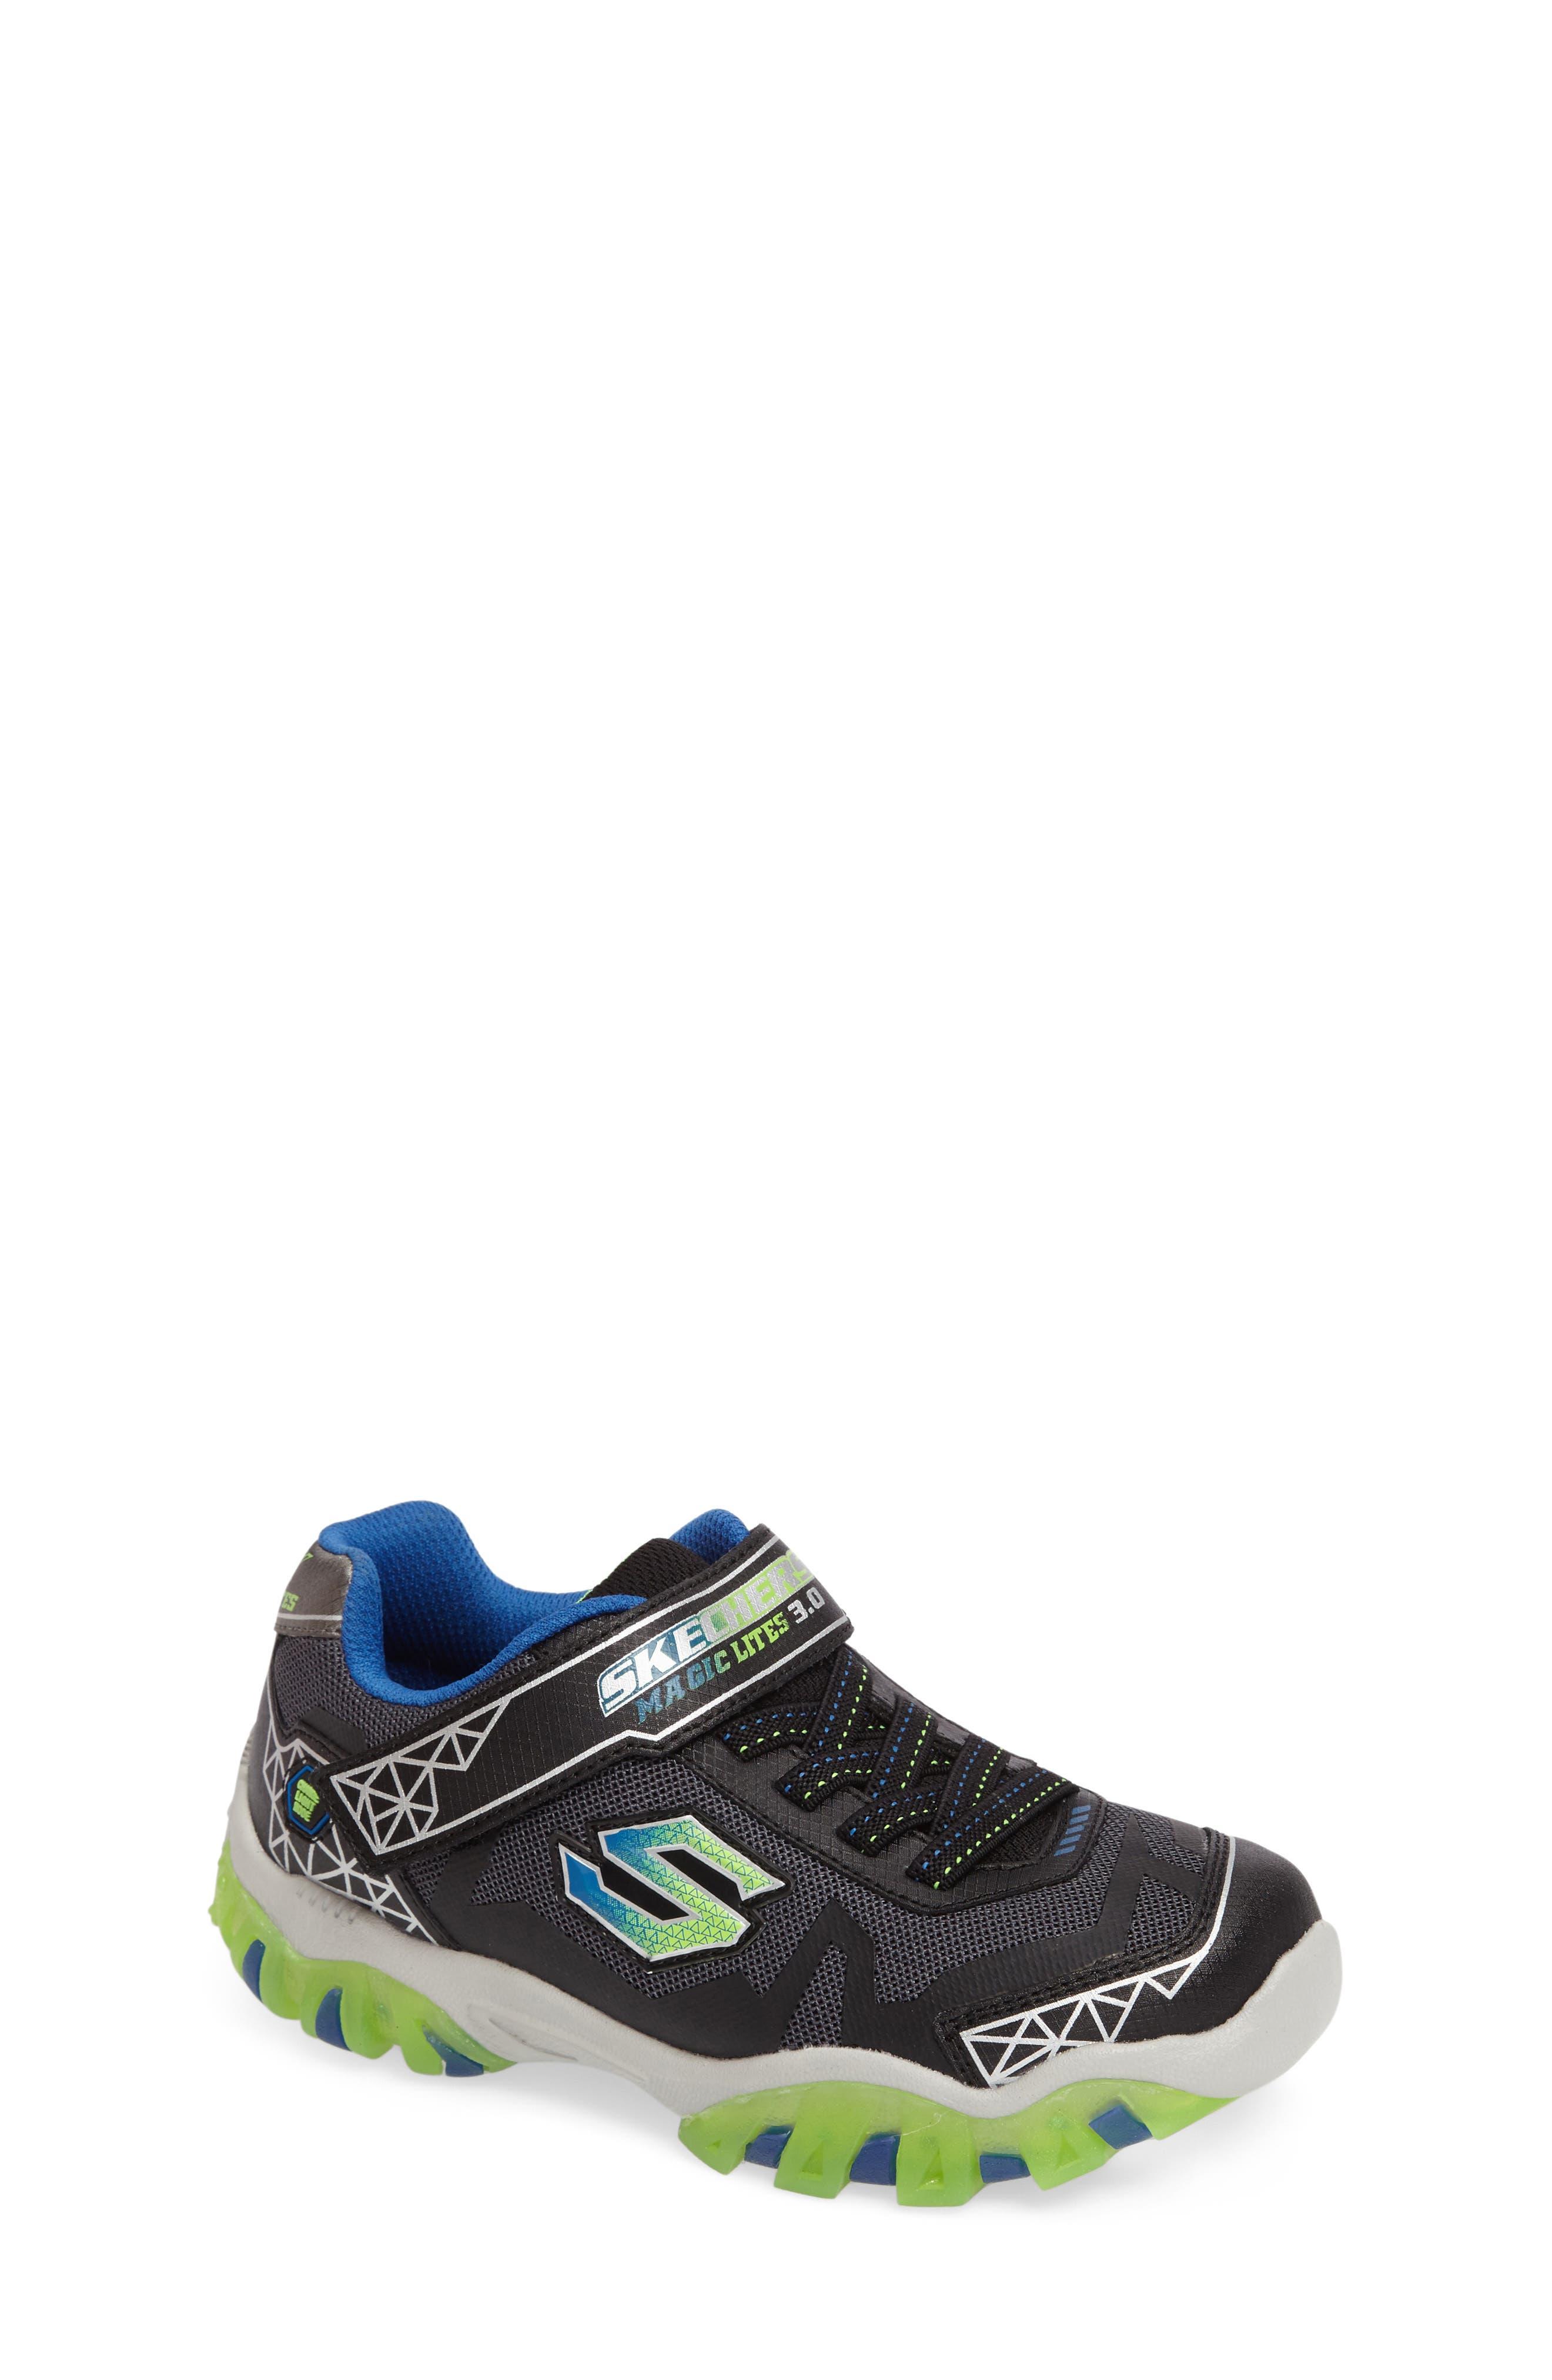 Magic Lites - Street Lightz 2.0 Light-Up Sneaker,                         Main,                         color, Black/ Green